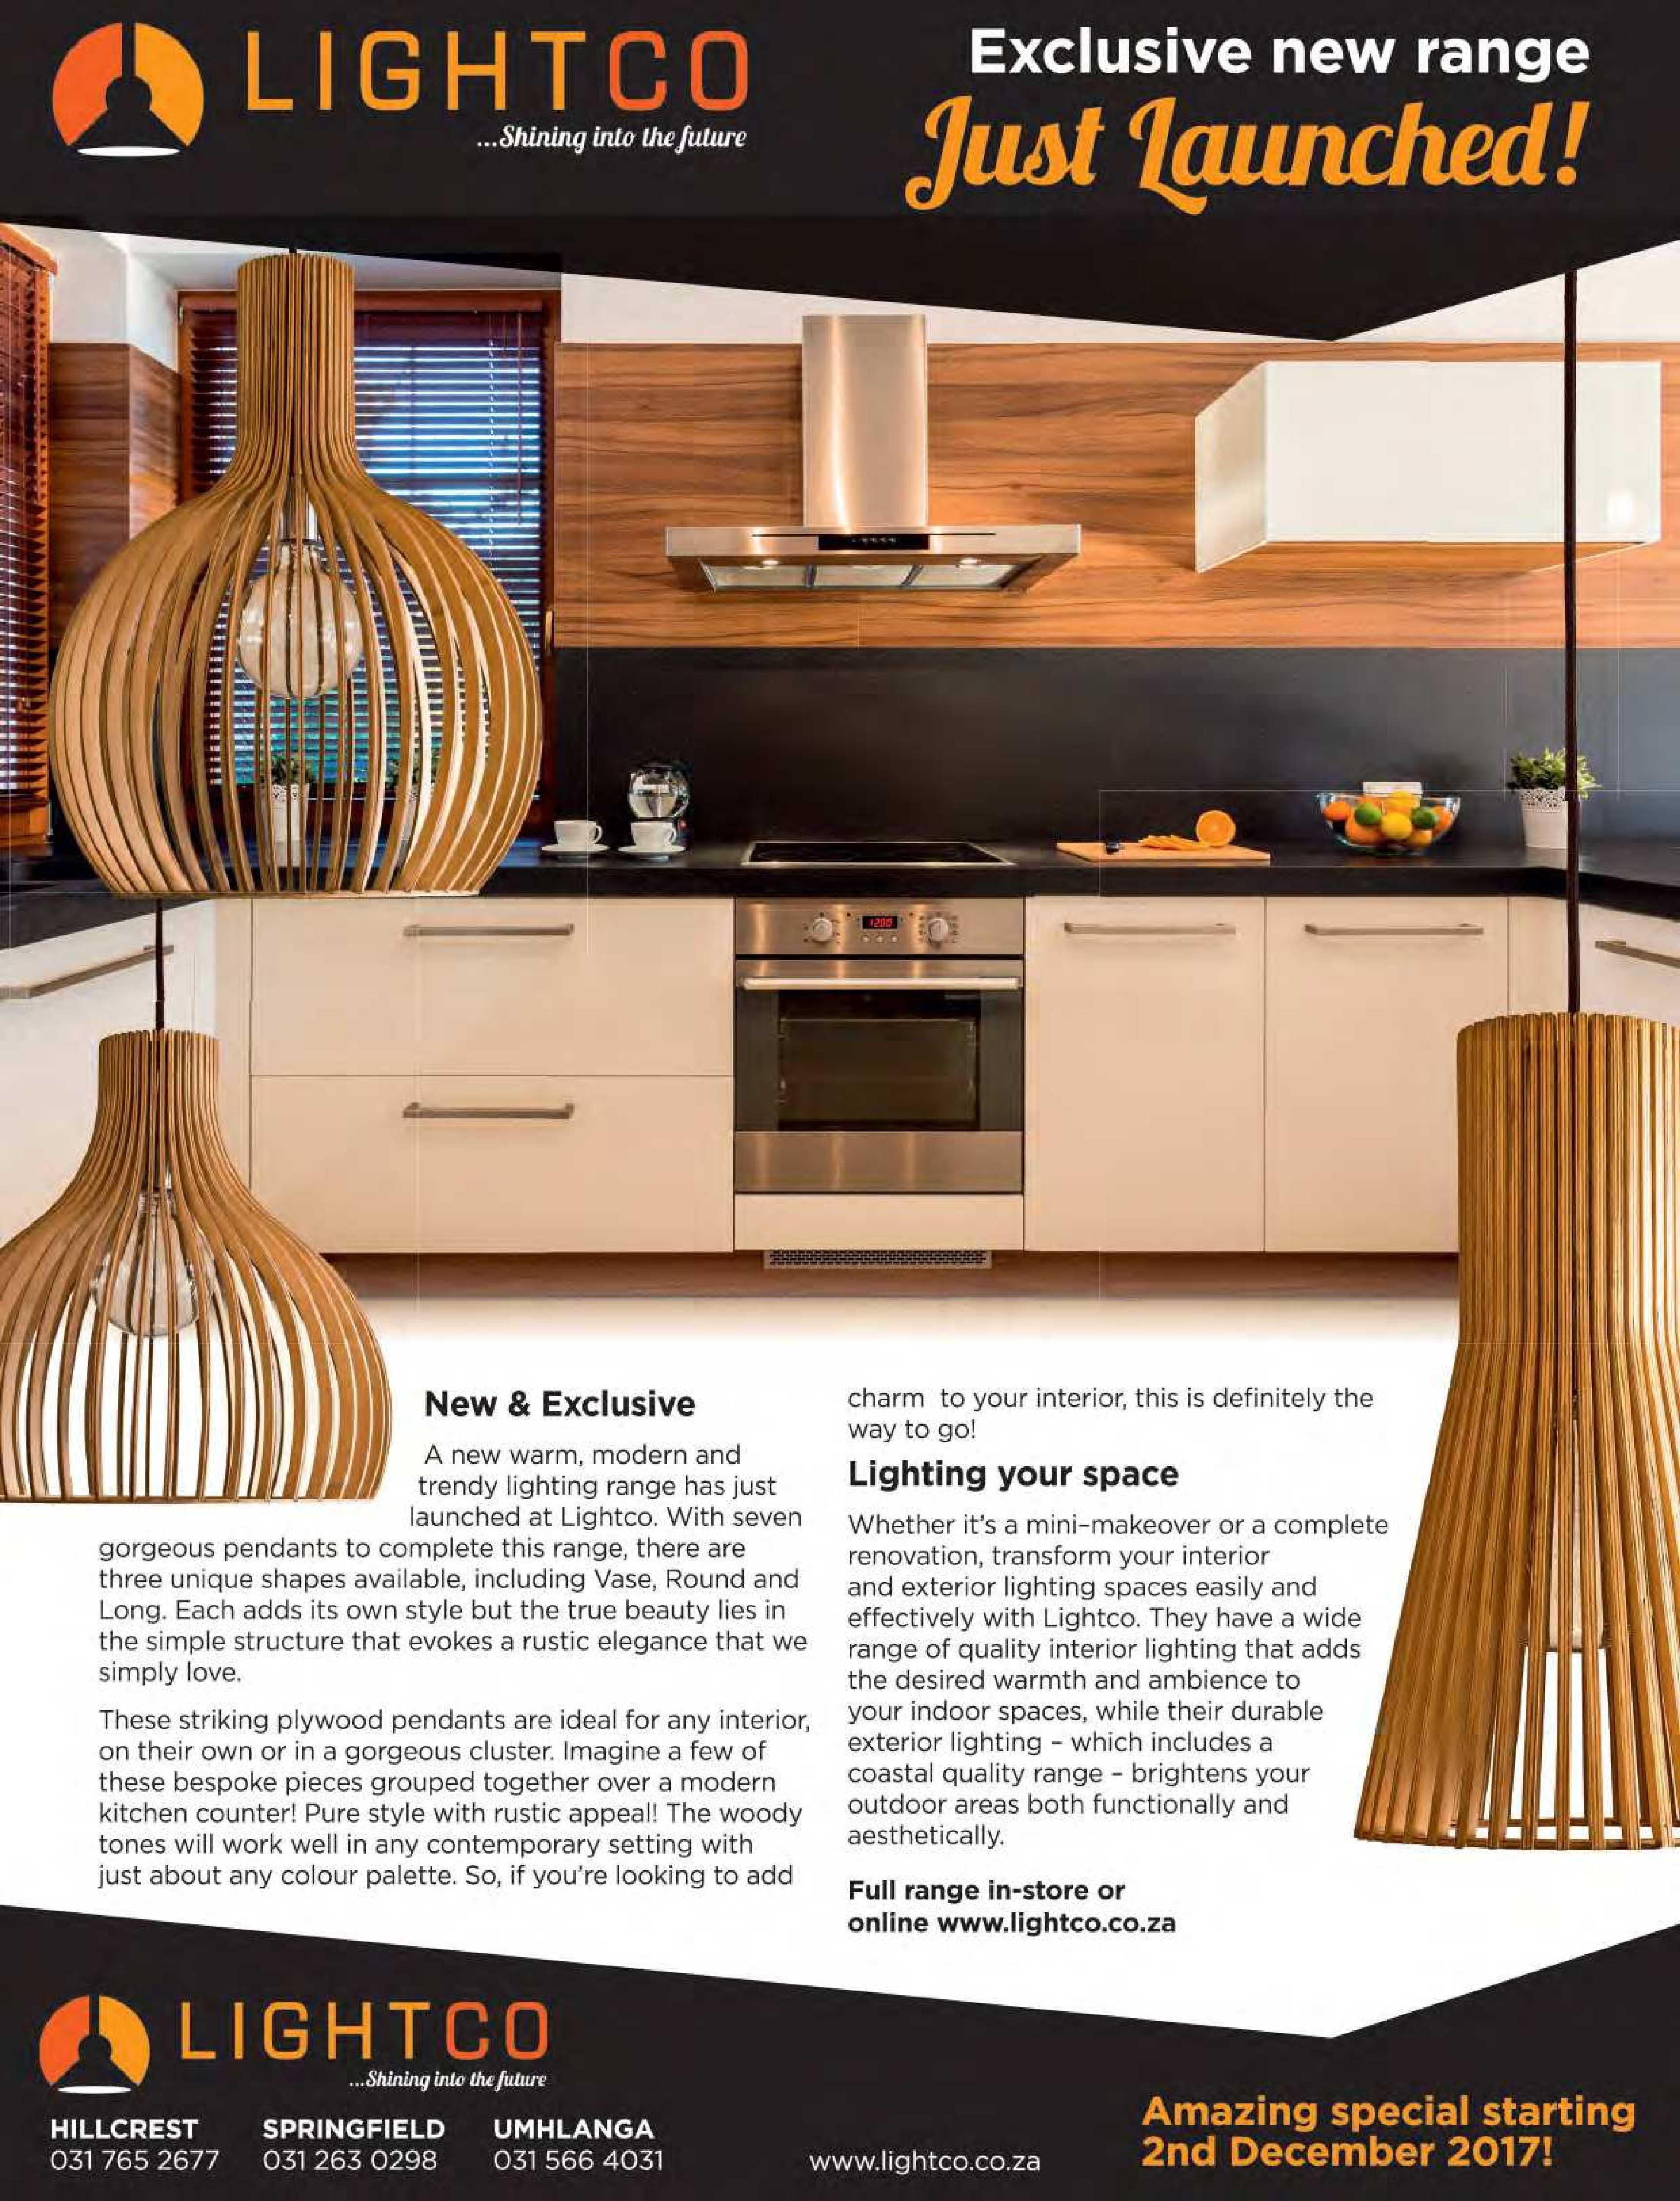 get-magazine-ballitoumhlanga-december-2017-january-2018-2-epapers-page-40